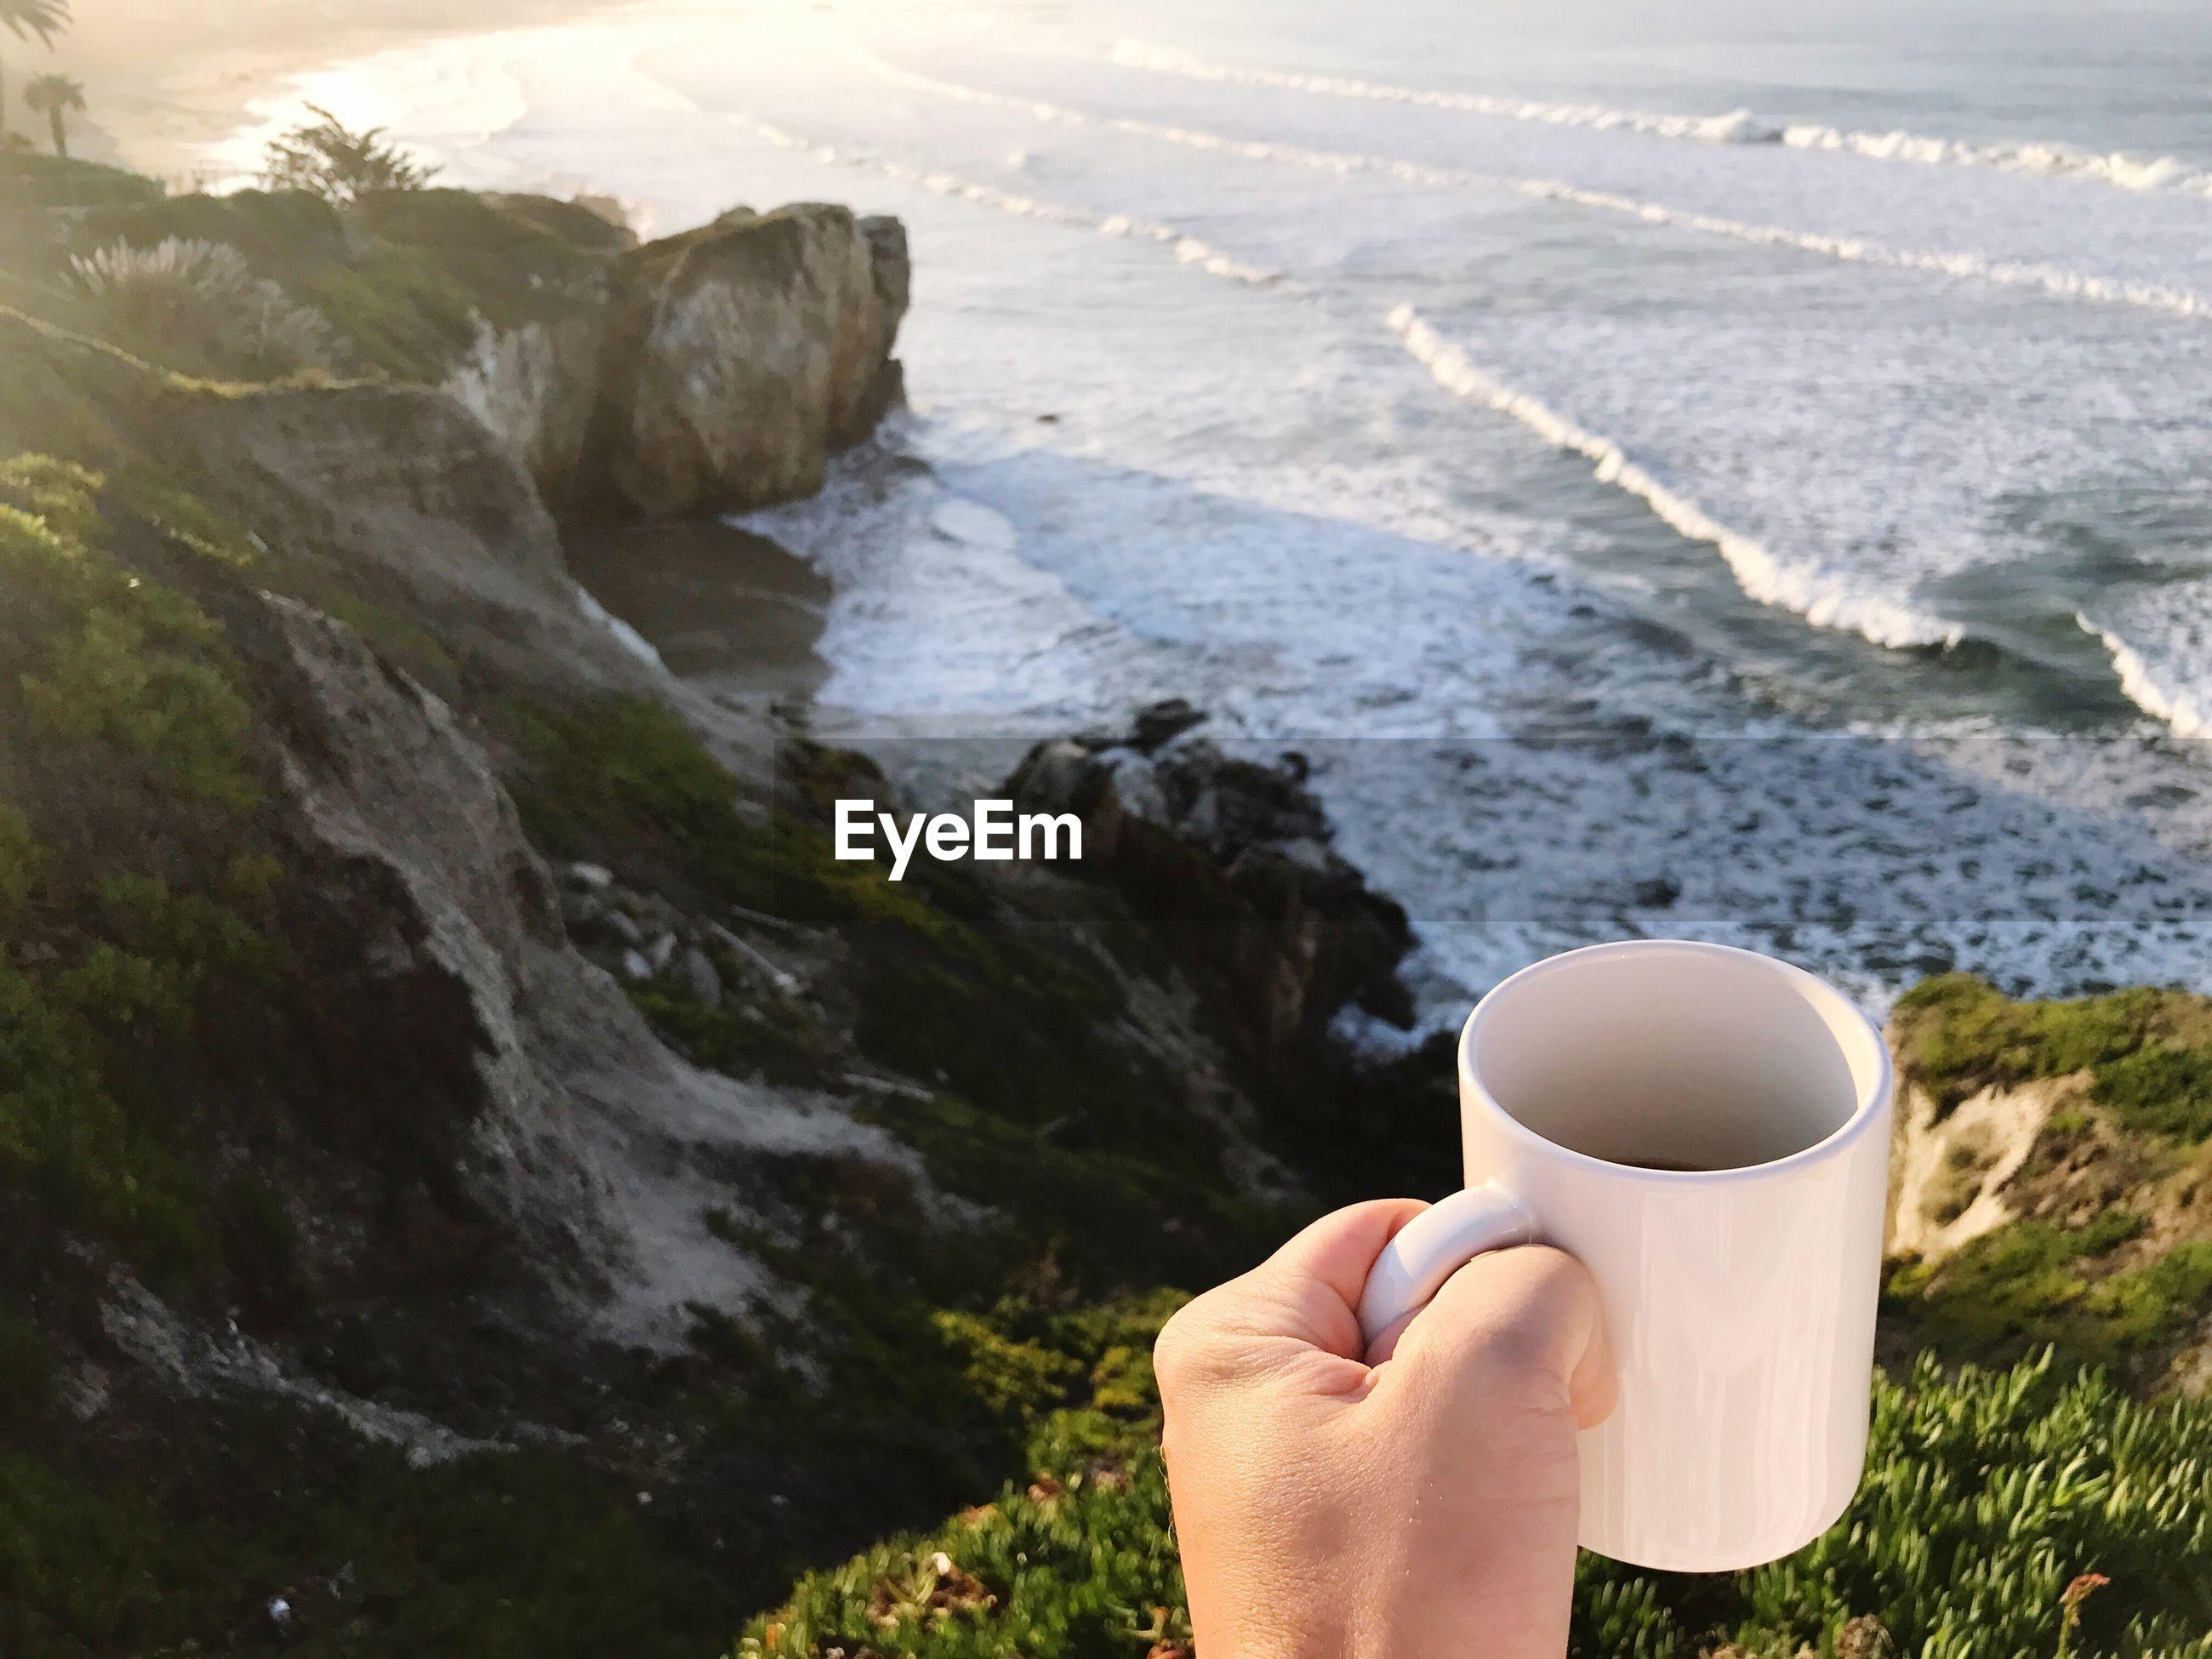 Cropped image of hand holding coffee mug against sea